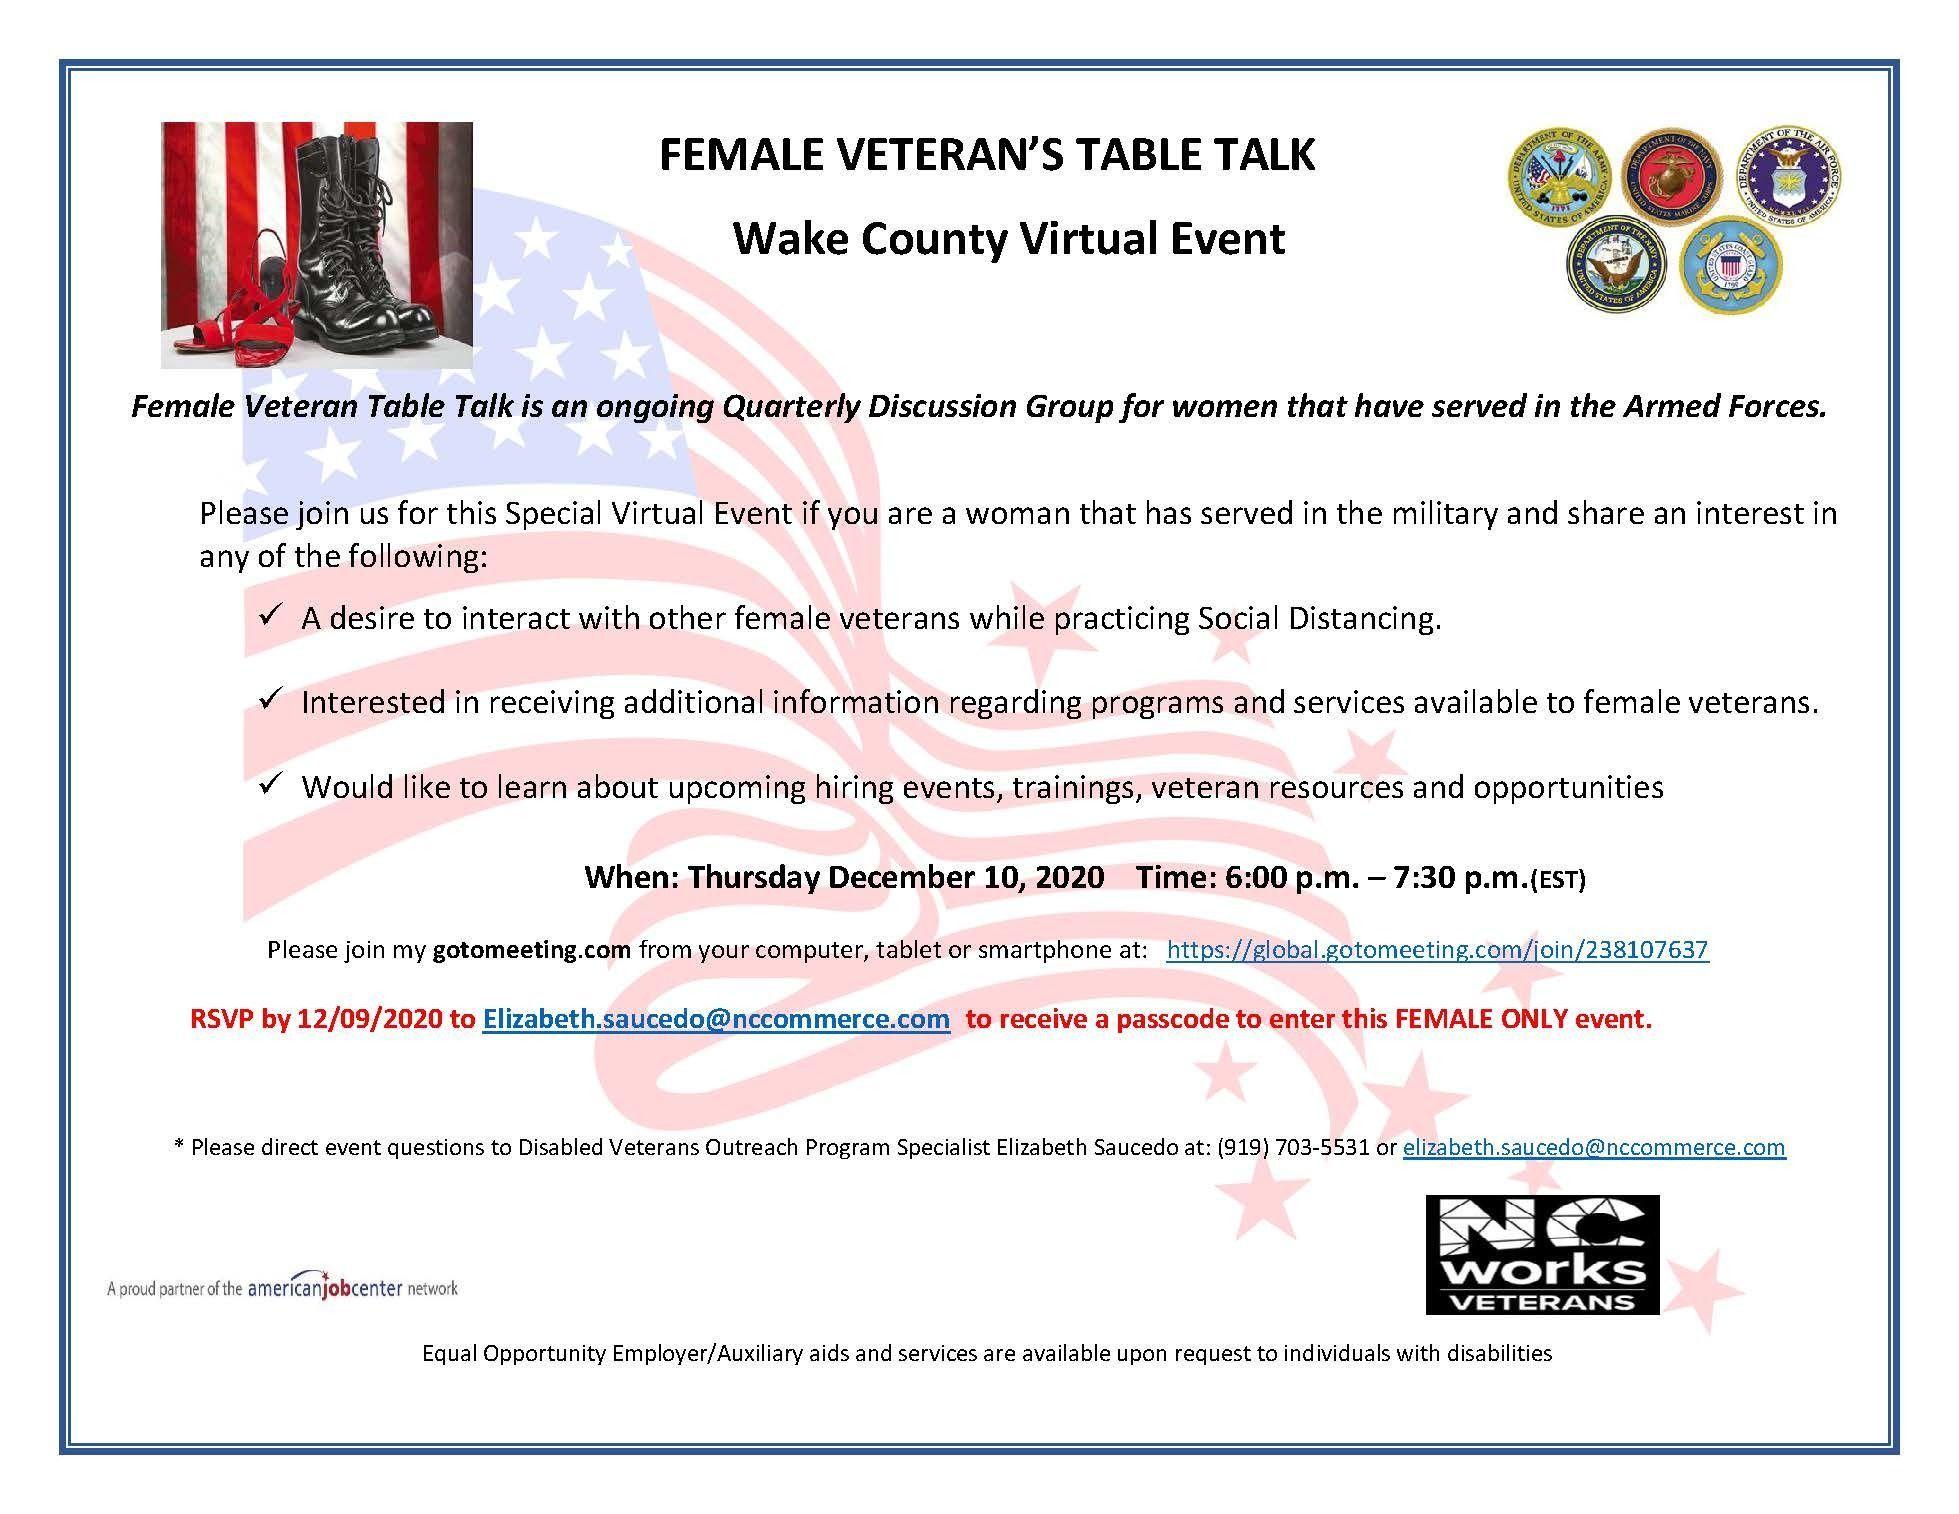 Female Veteran's Table Talk